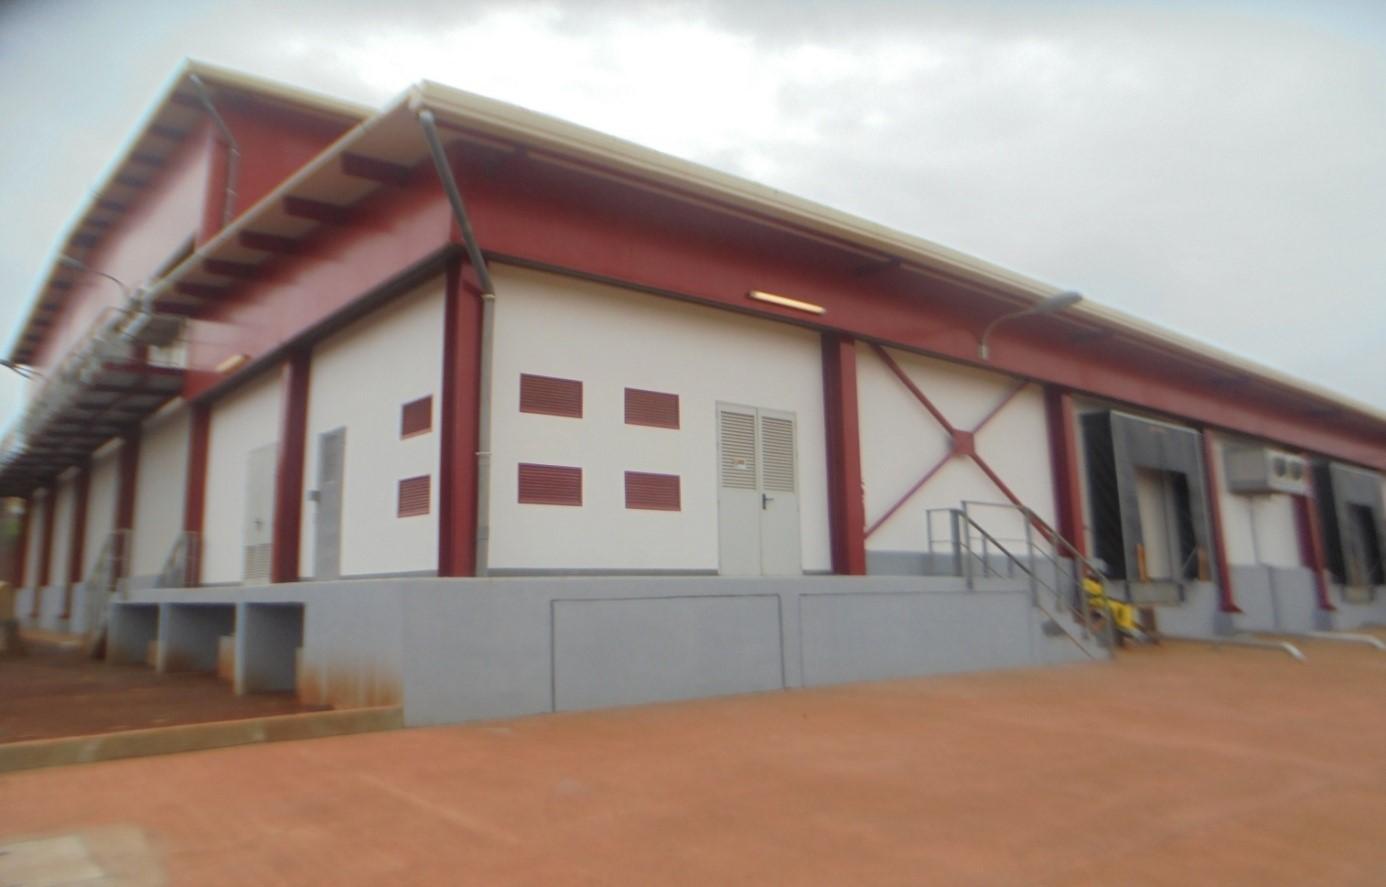 Façade principale de l'entrepôt frigorifique de 6000 m3 à Yaoundé